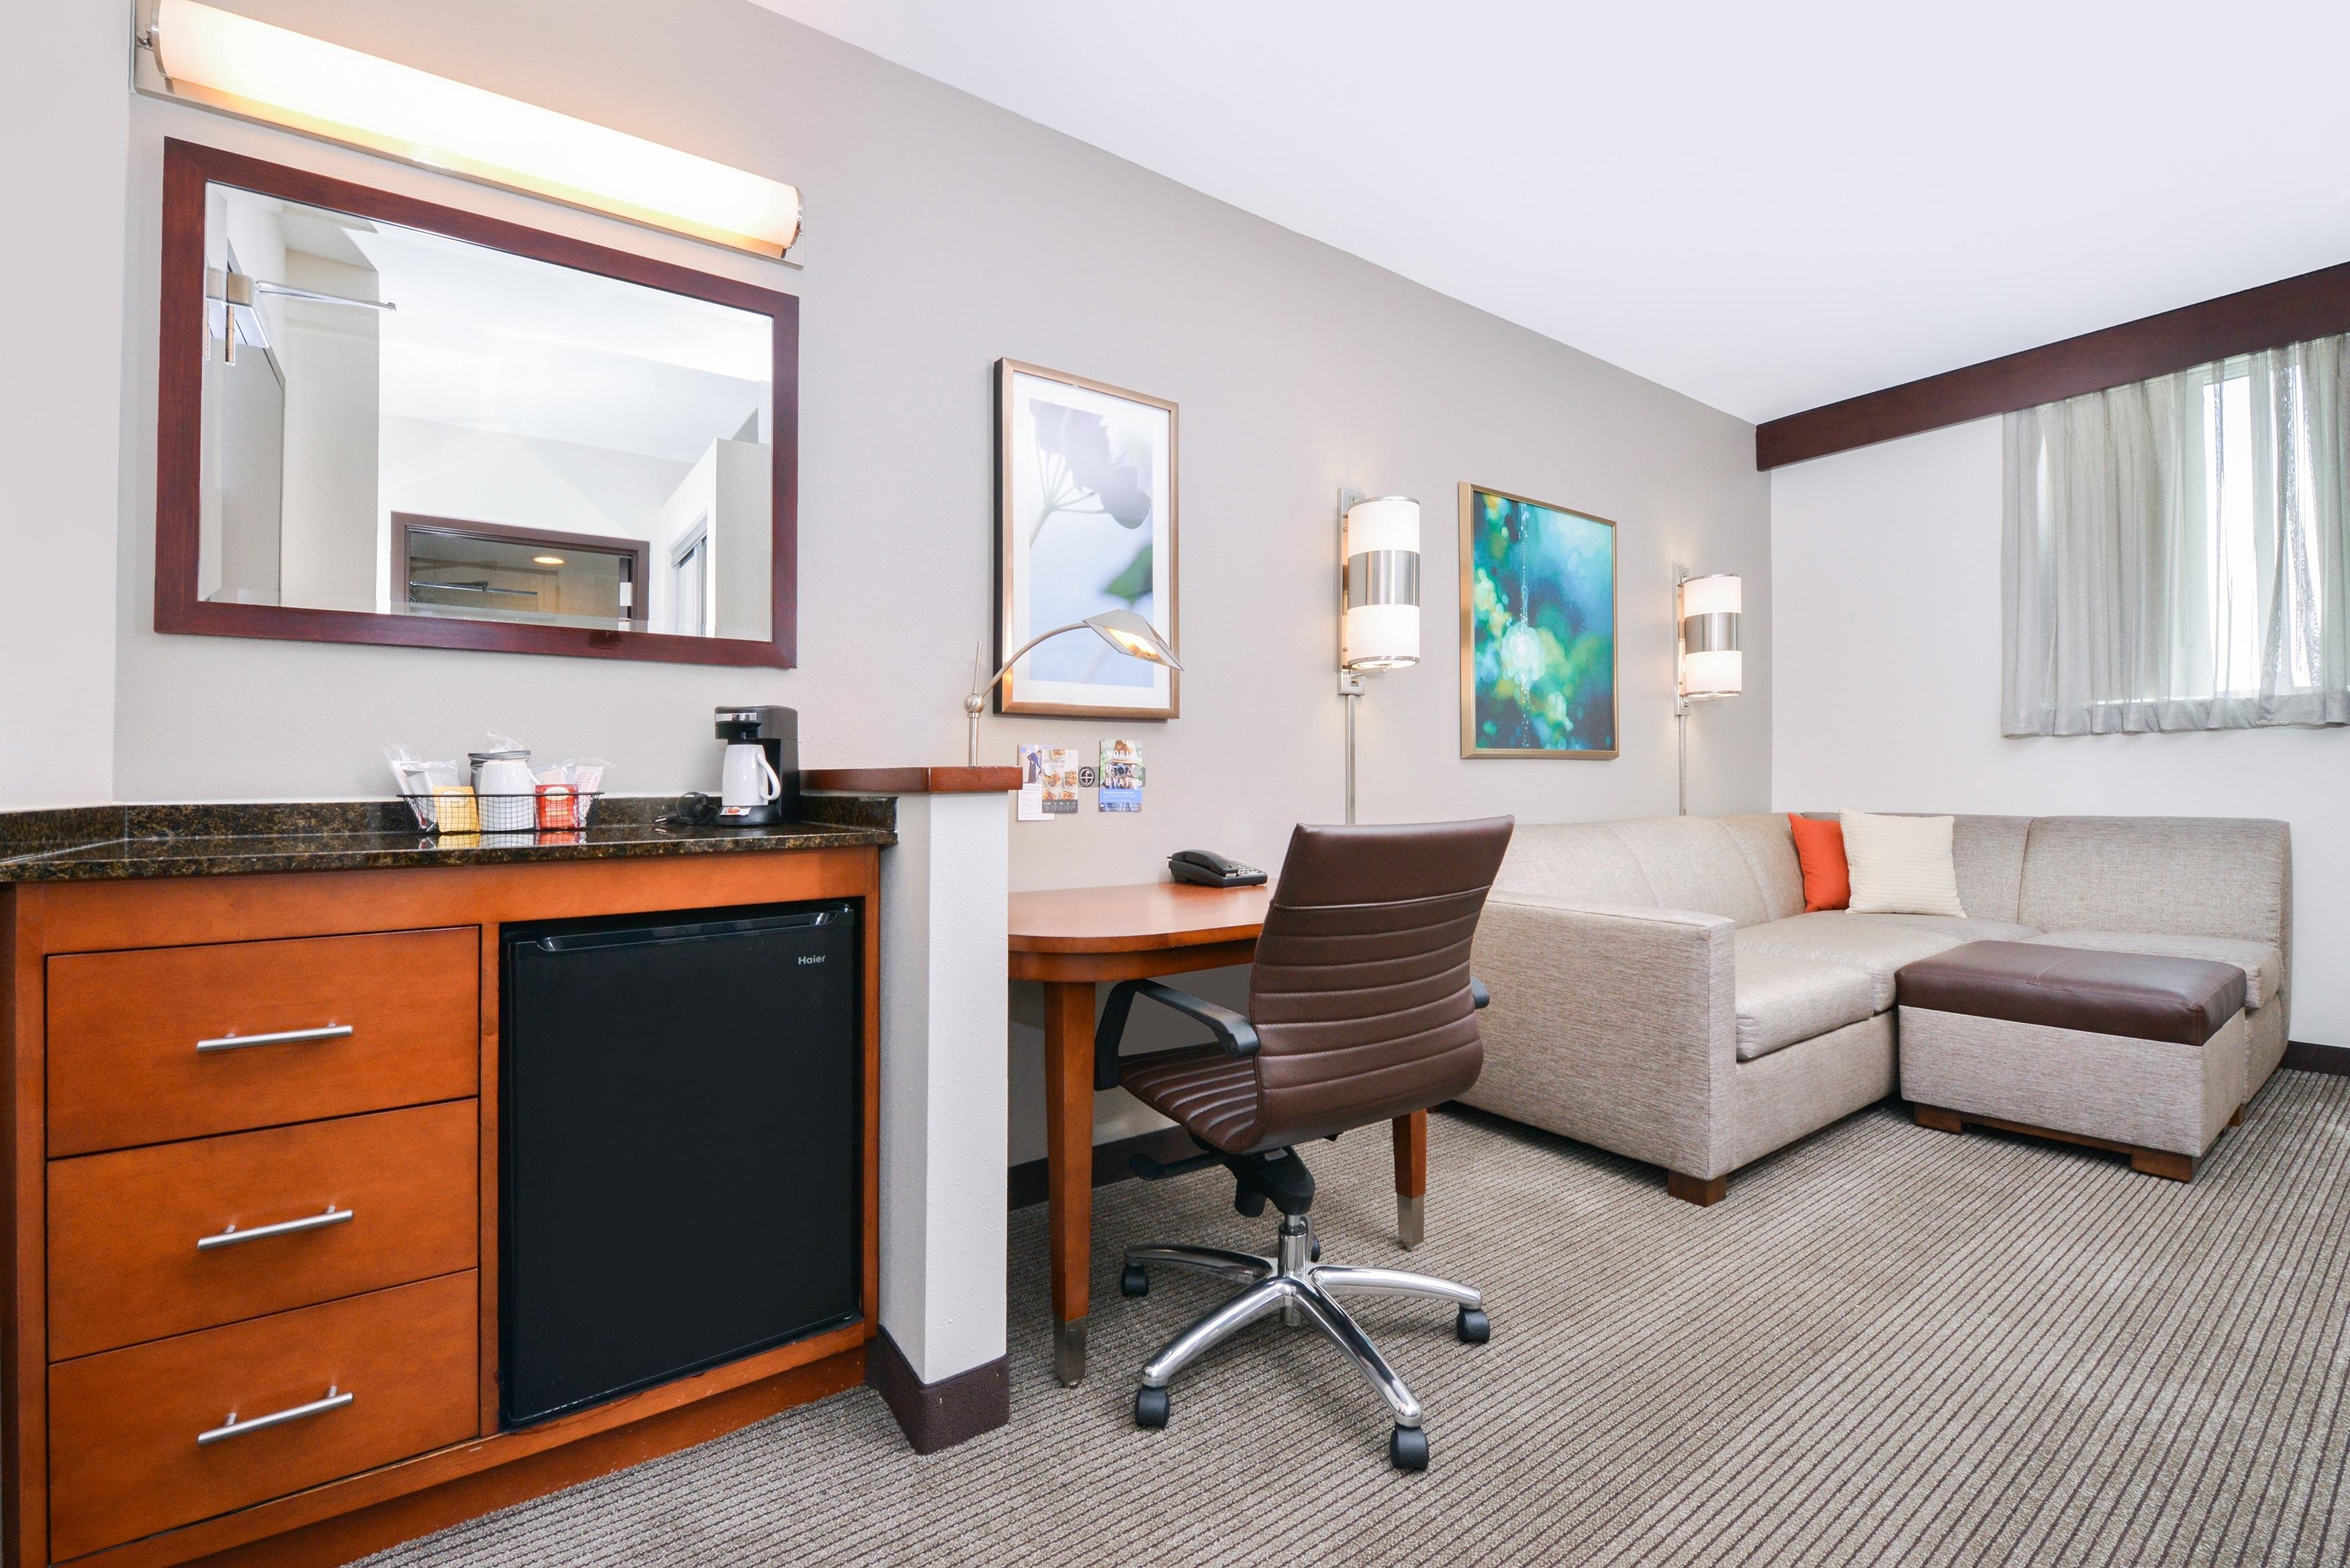 Hyatt Place Chesapeake/Greenbrier image 9